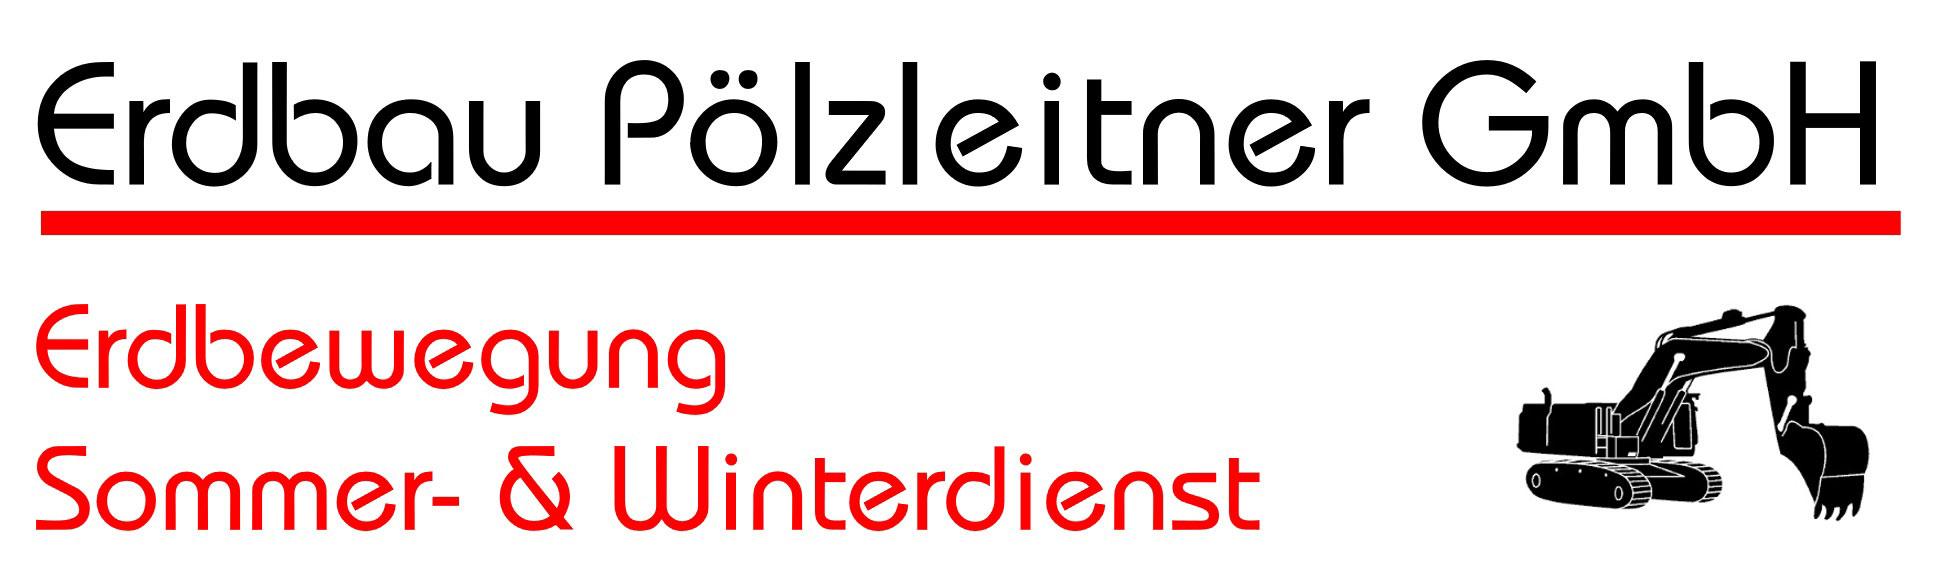 Erdbau Pölzleitner GmbH | Baggerung | Abbruch | Mähen | Gartenbau